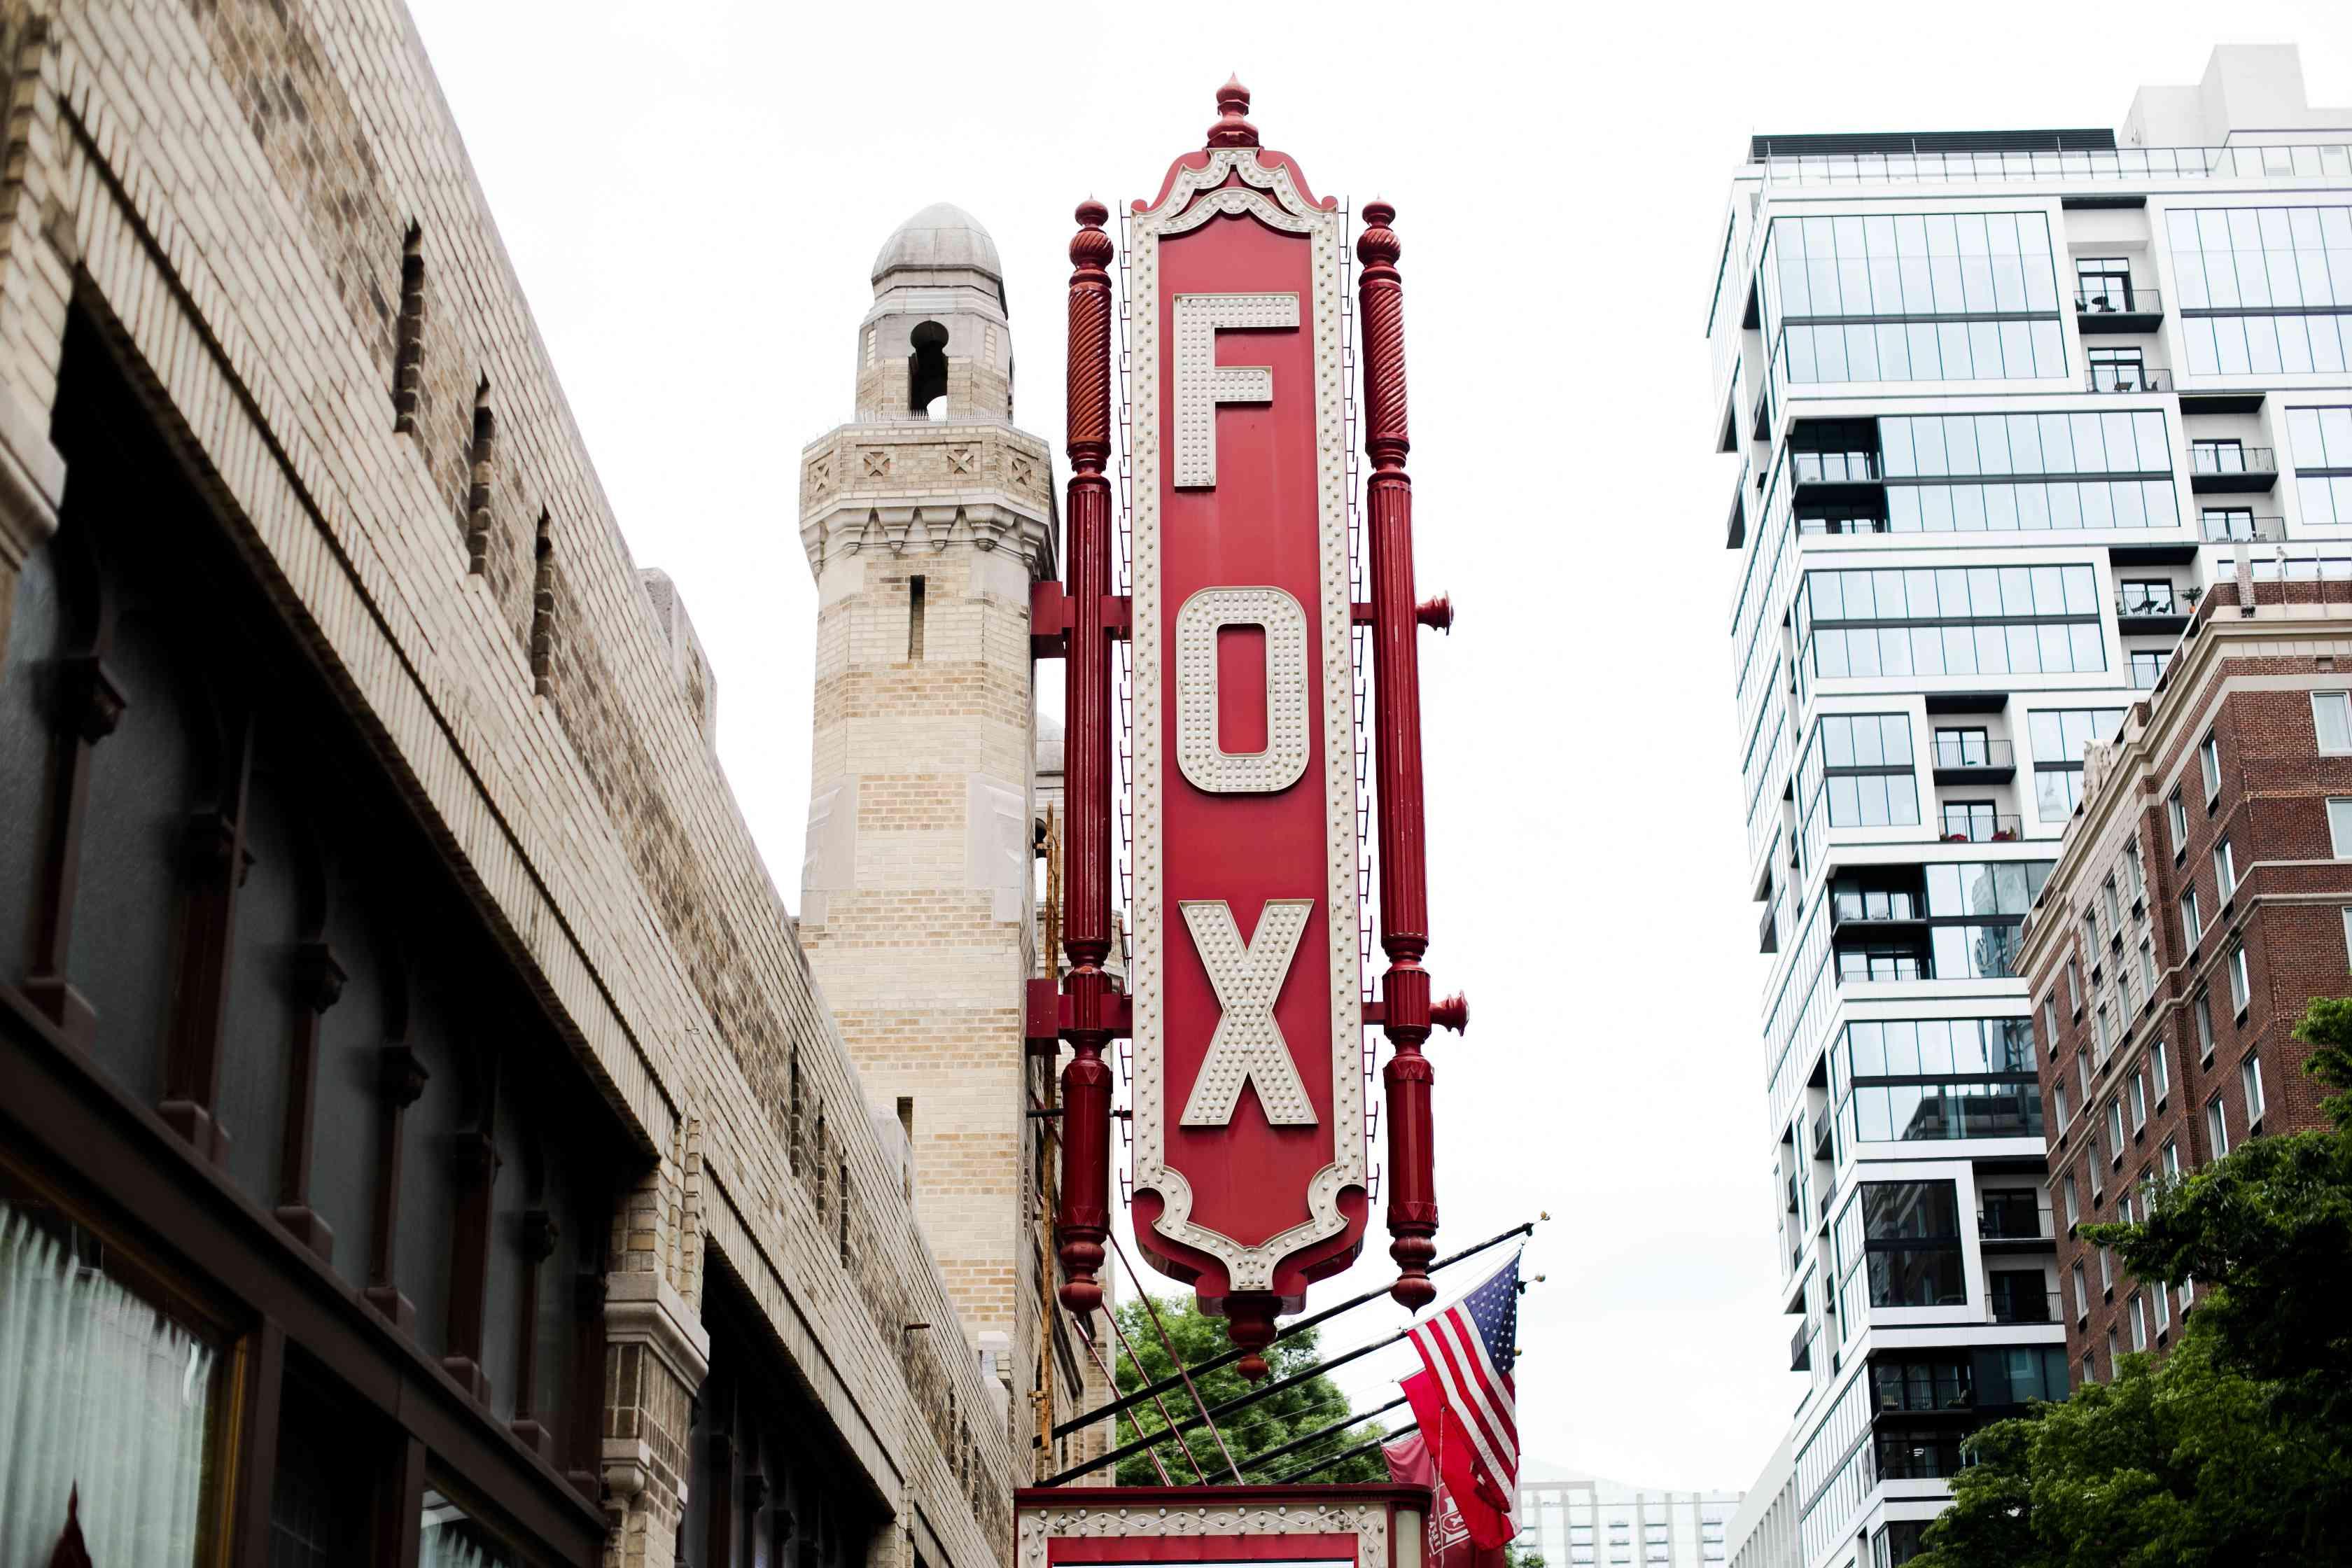 The Fabulous Fox Theatre in Atlanta, Georgia